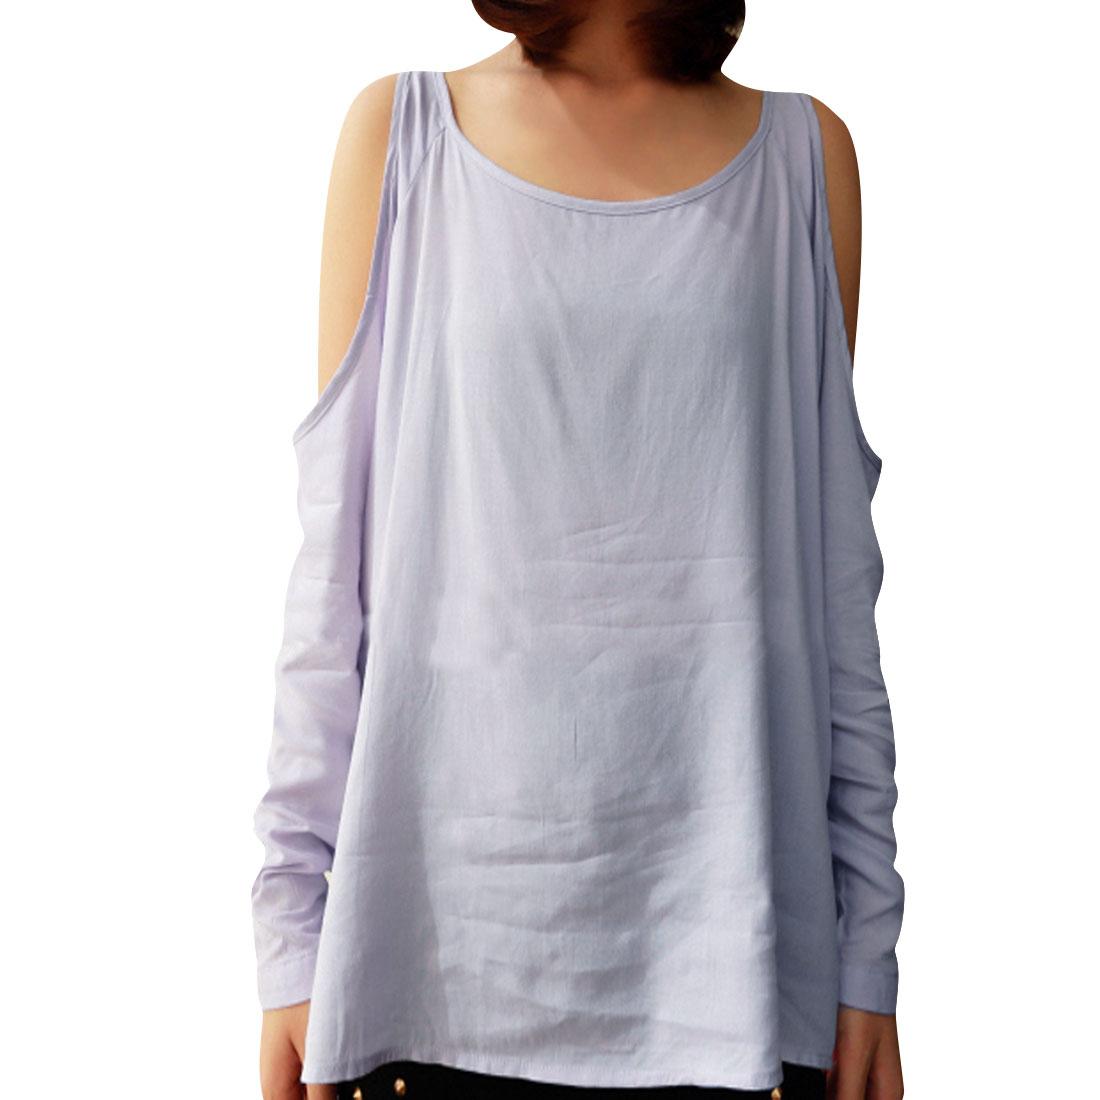 Ladies Light Purple Long Sleeves Sccop Neck Cut Out Blouse XS